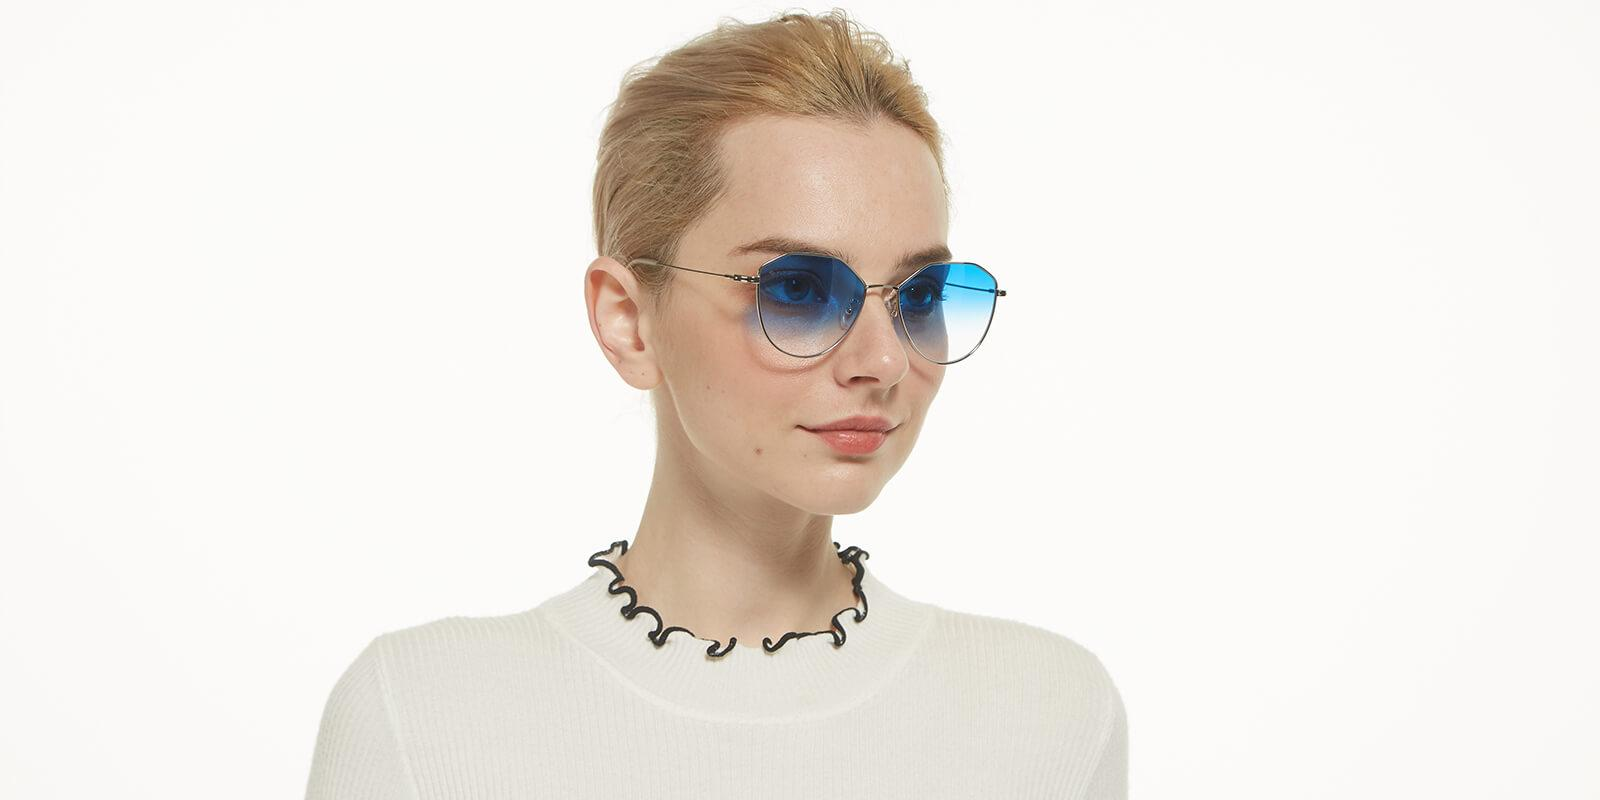 Surberly-Silver-Metal-Eyeglasses-detail1